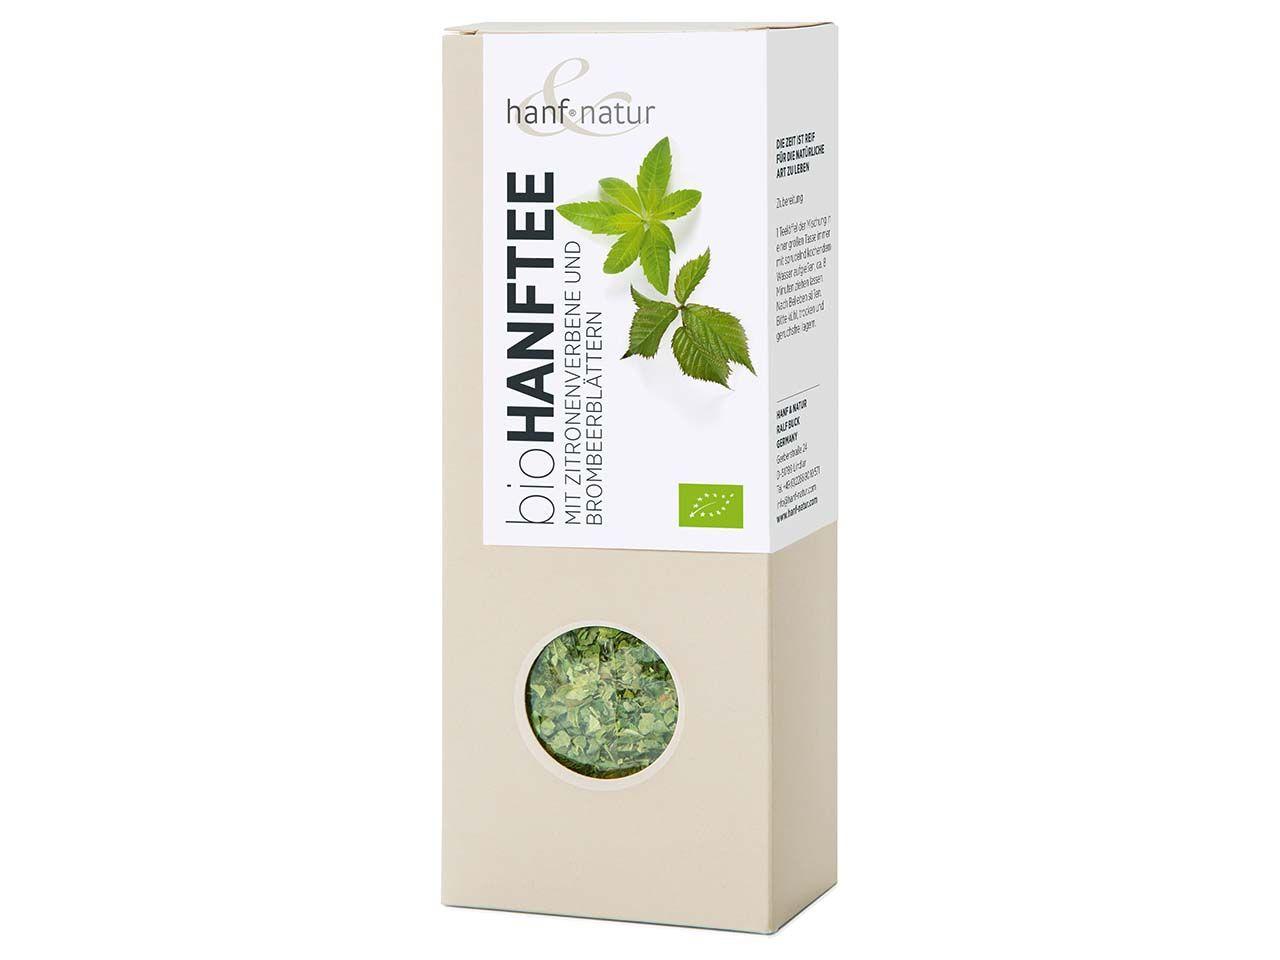 Hanf Natur Bio-Hanf-Teemischung mit Zitronenverbene, 40 g 0-1034